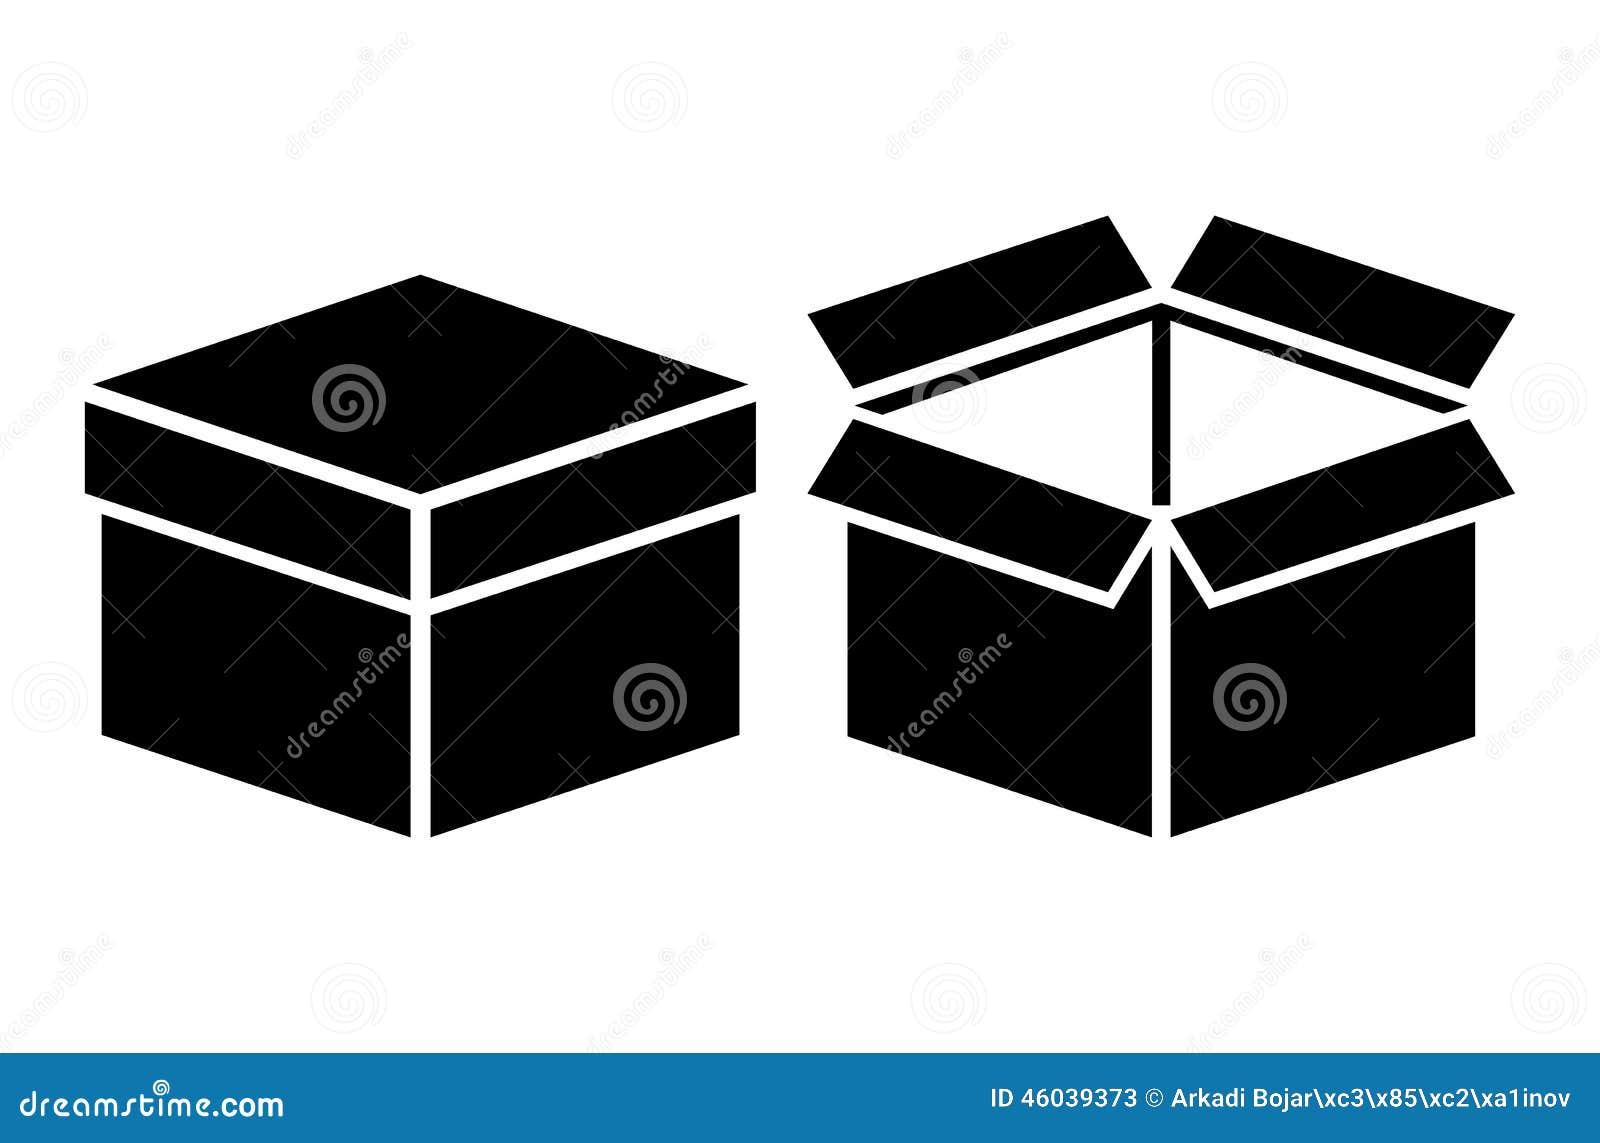 Open Closed Box Icon Stock Vector - Image: 46039373   1300 x 946 jpeg 73kB